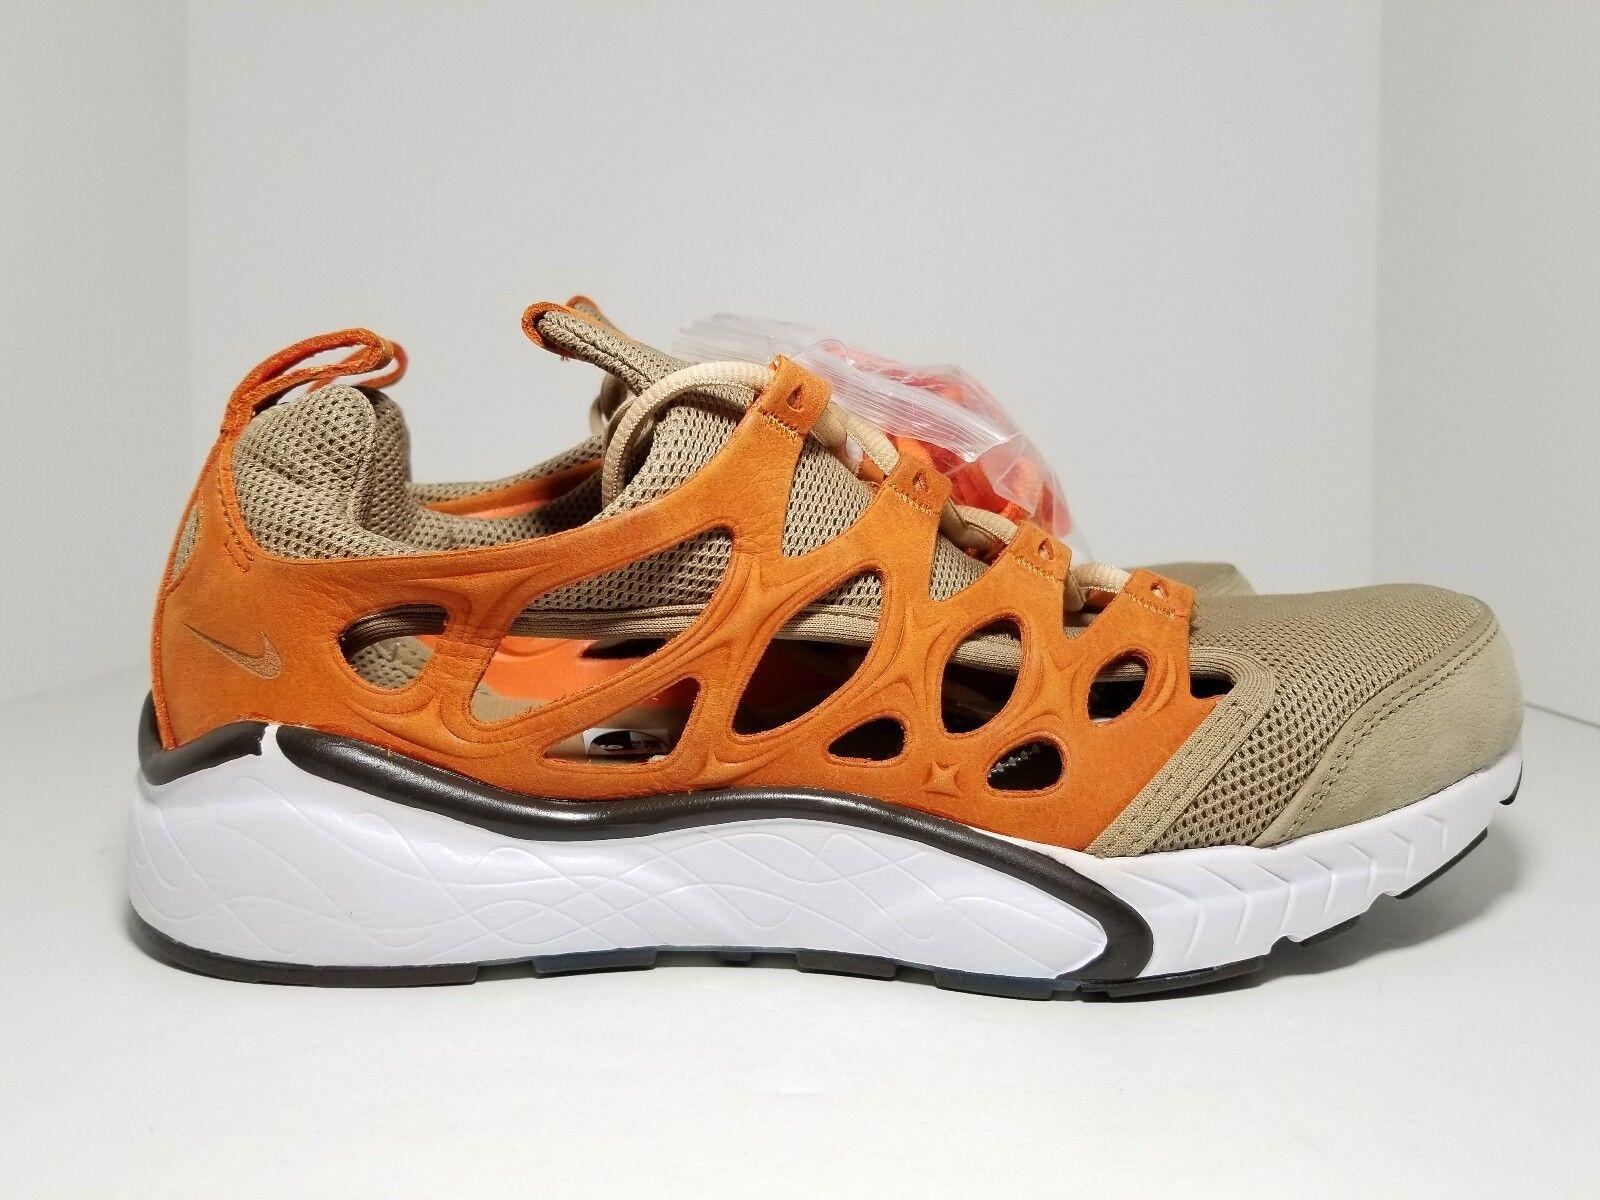 Nike air zoom chalapuka nikelab sicuro vachetta tan al sicuro nikelab 872634-202 scarpe da uomo taglia 9 074706